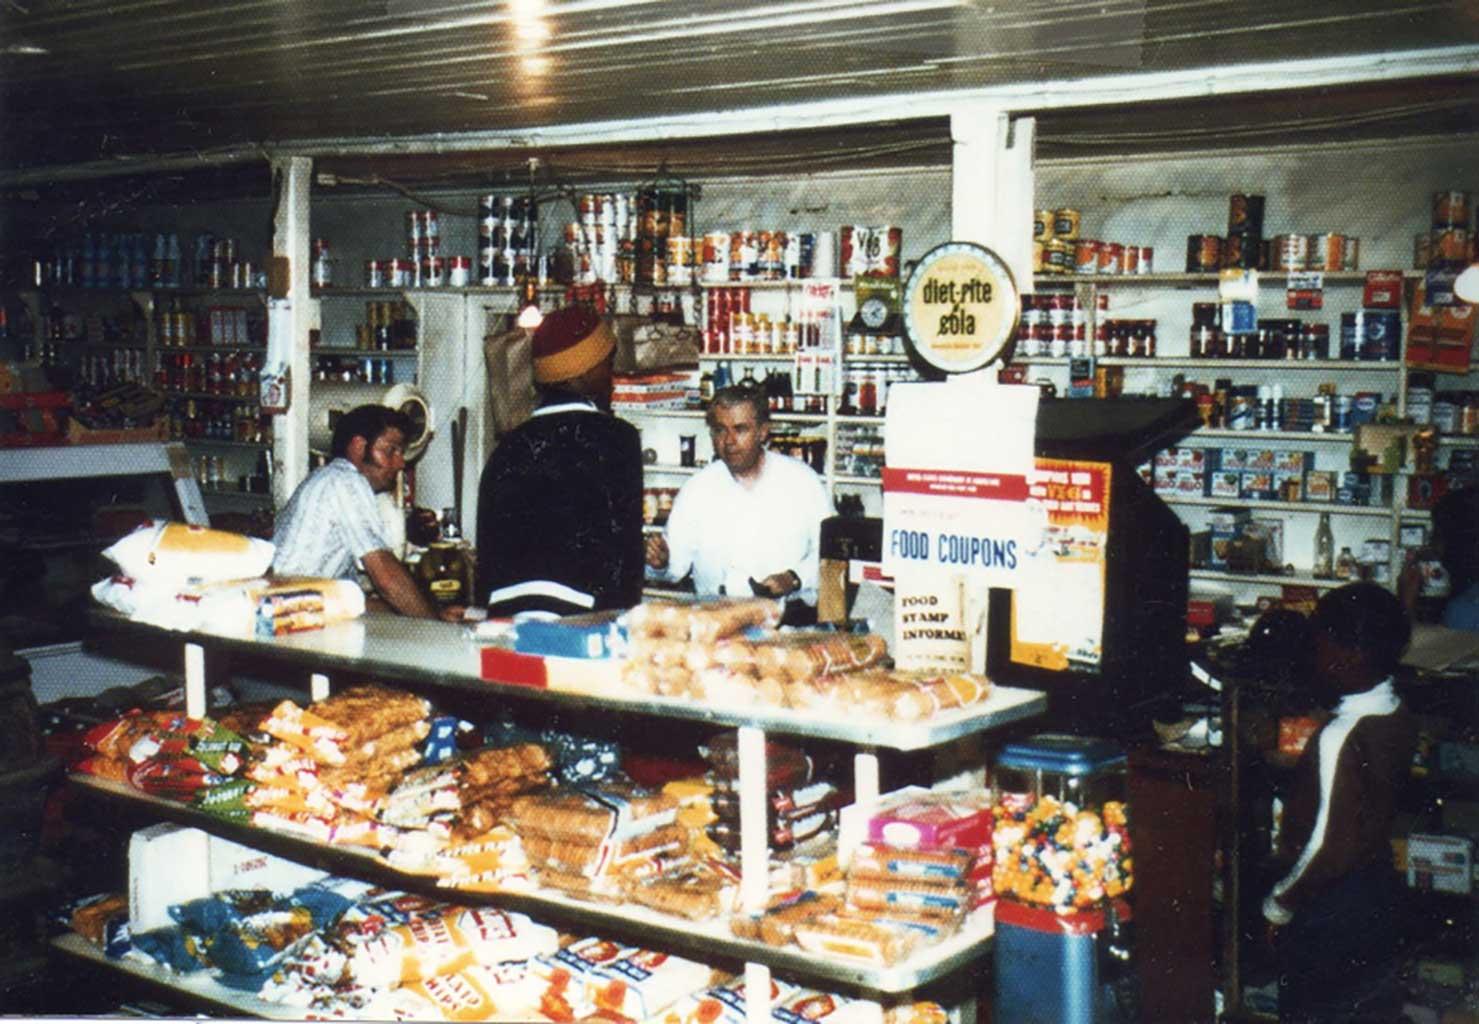 inside-daileys-store-1998-img771